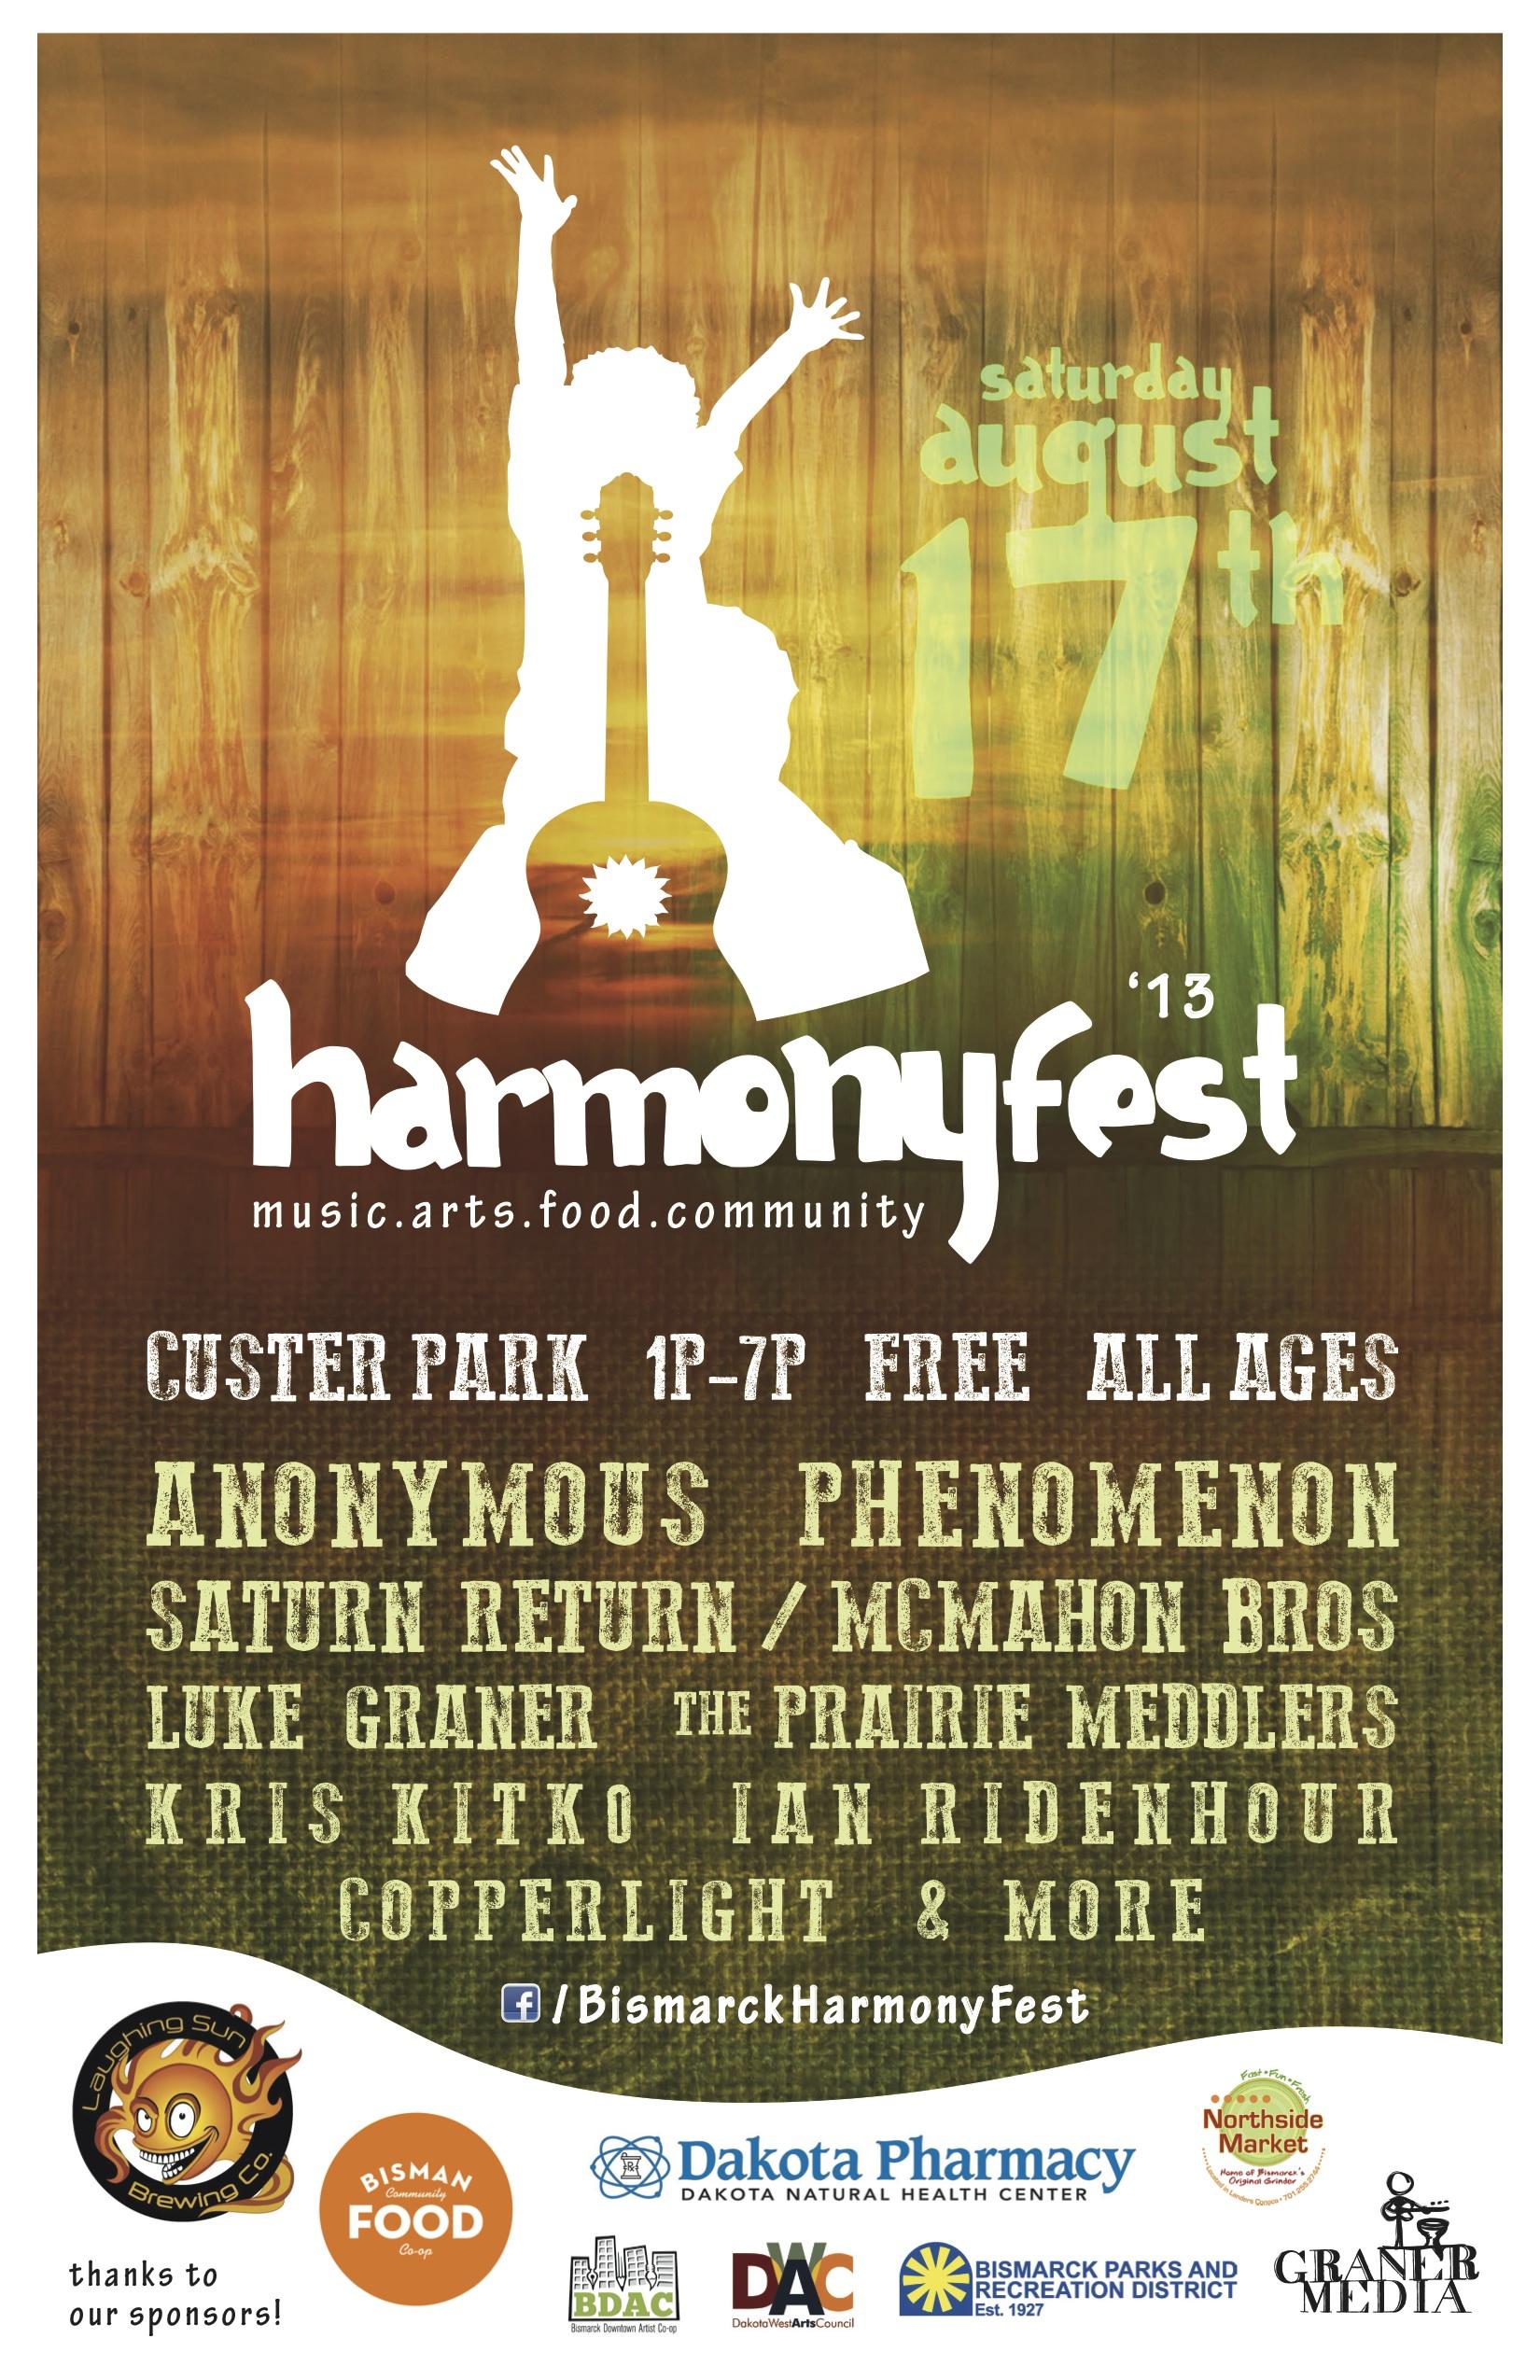 Harmony Poster 2013.jpg